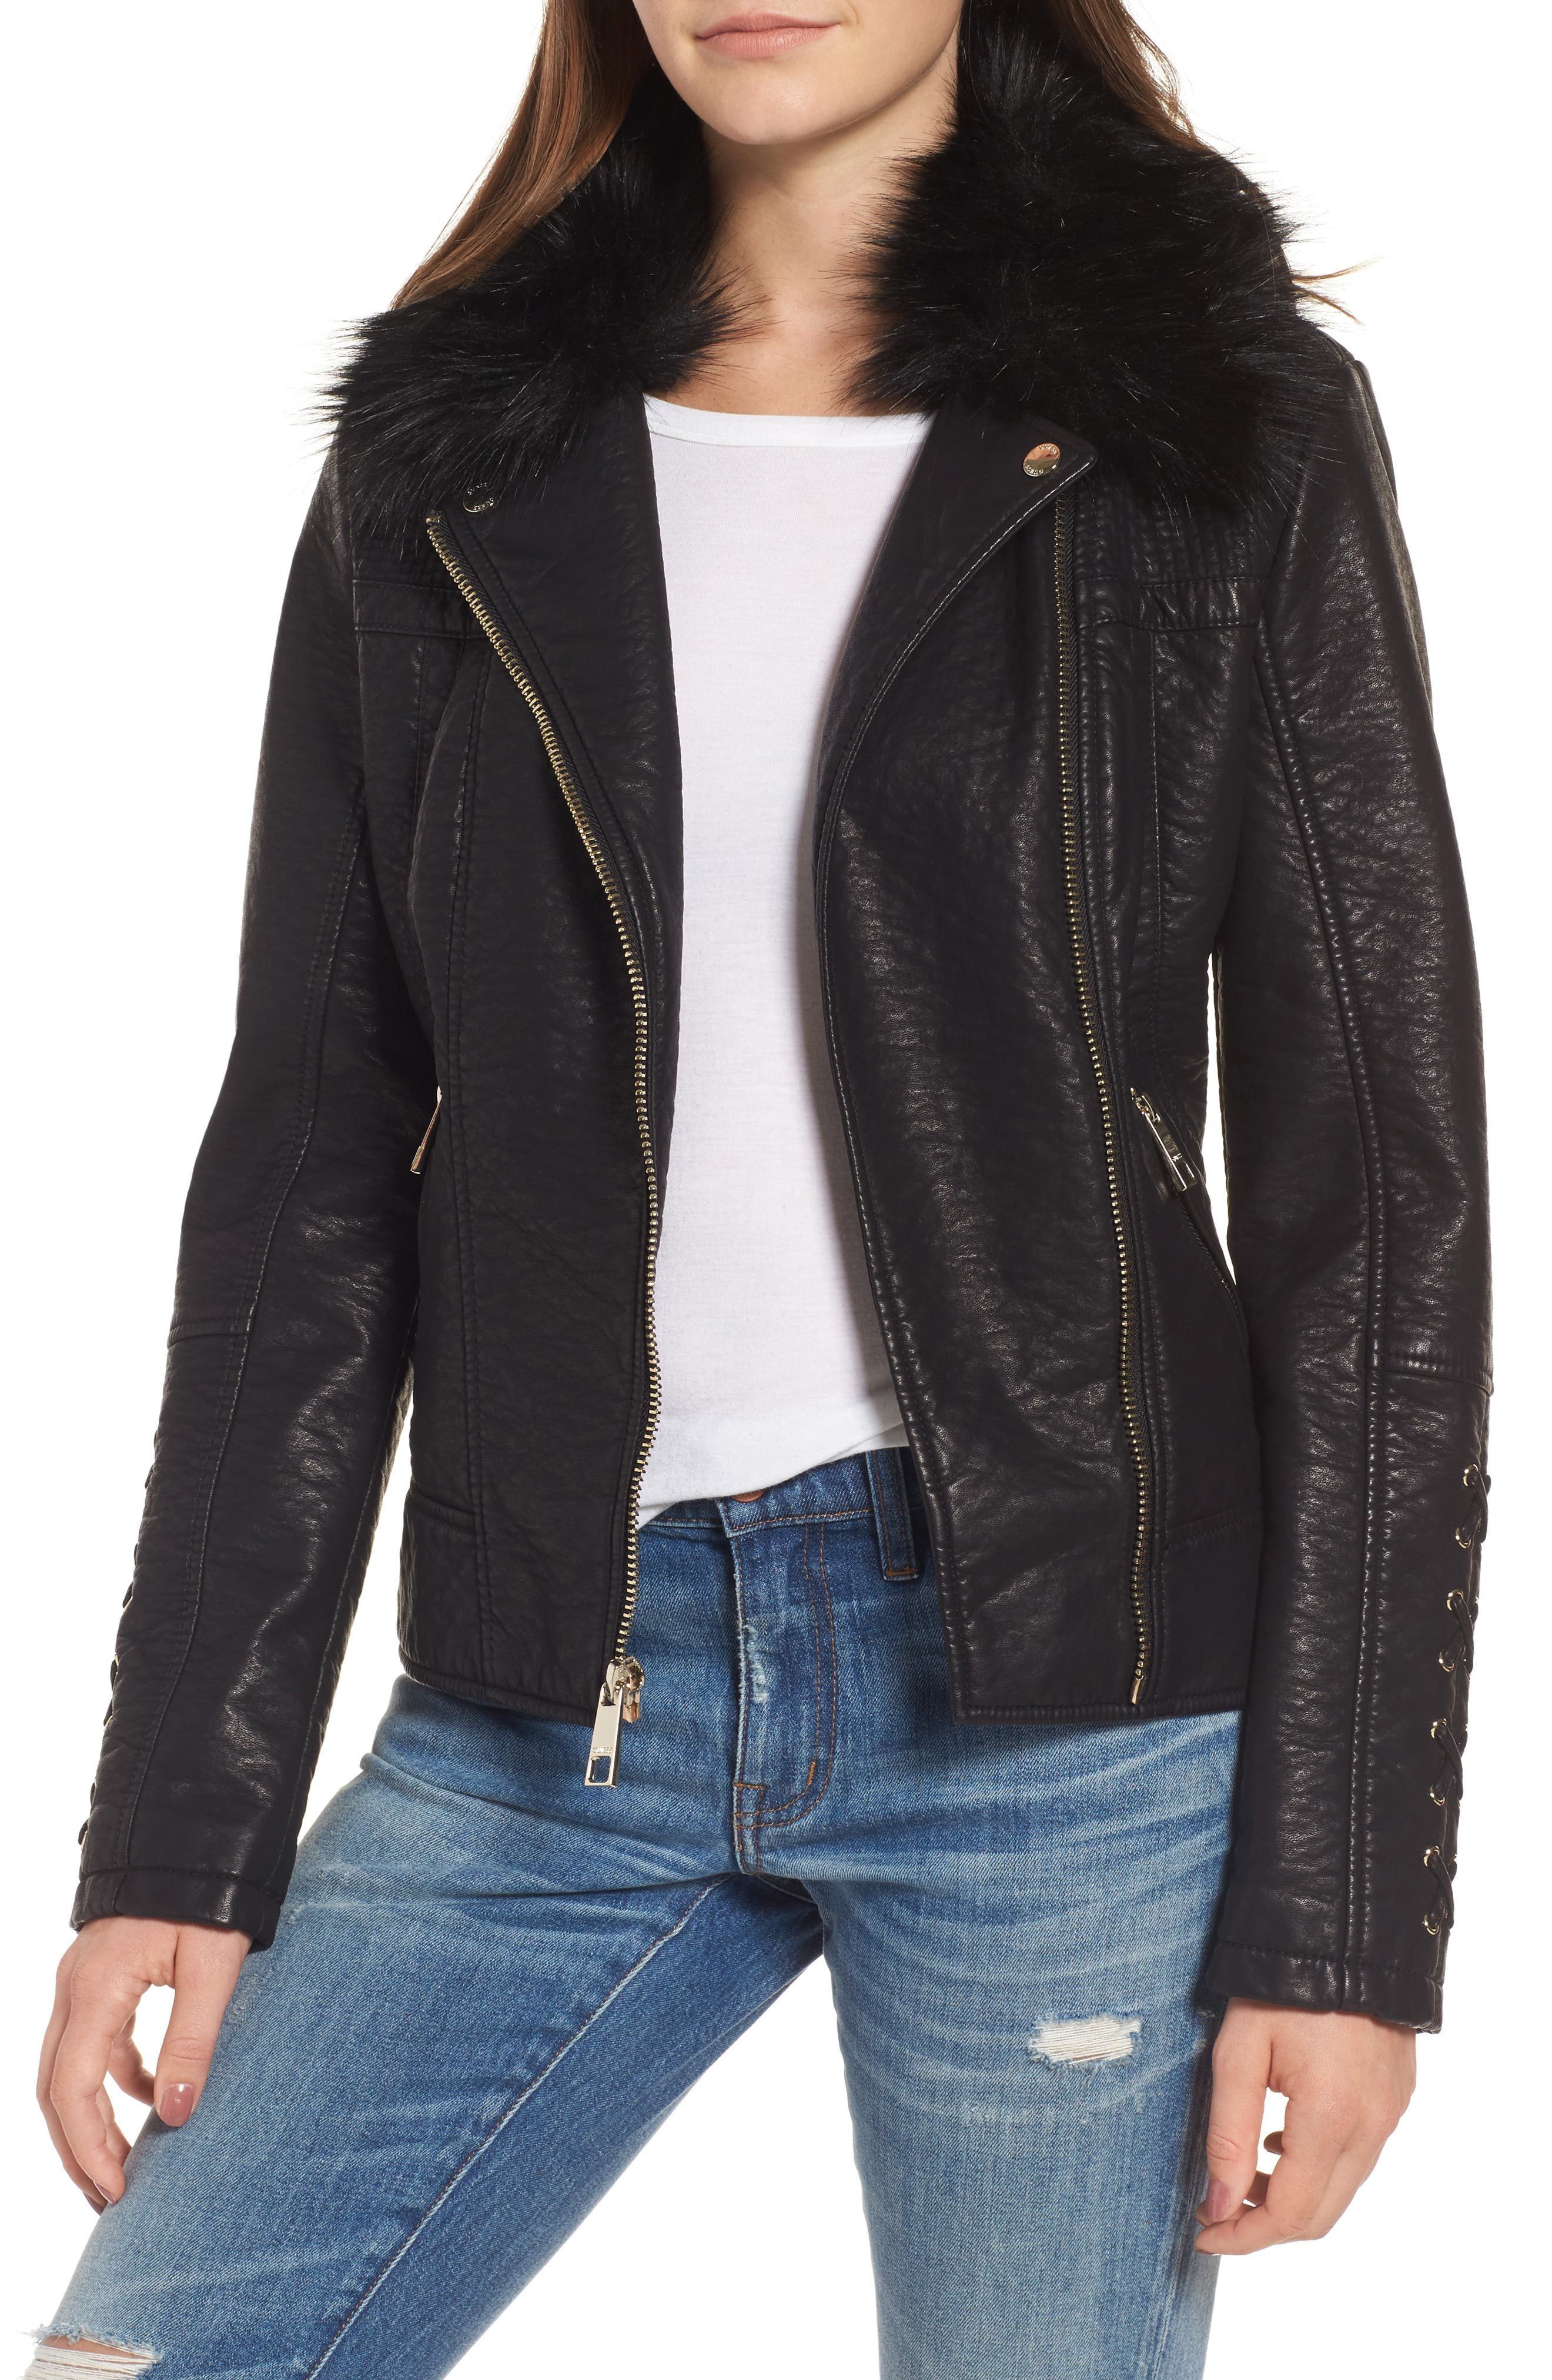 Alternate Image 1 Selected - GUESS Faux Fur Collar Jacket